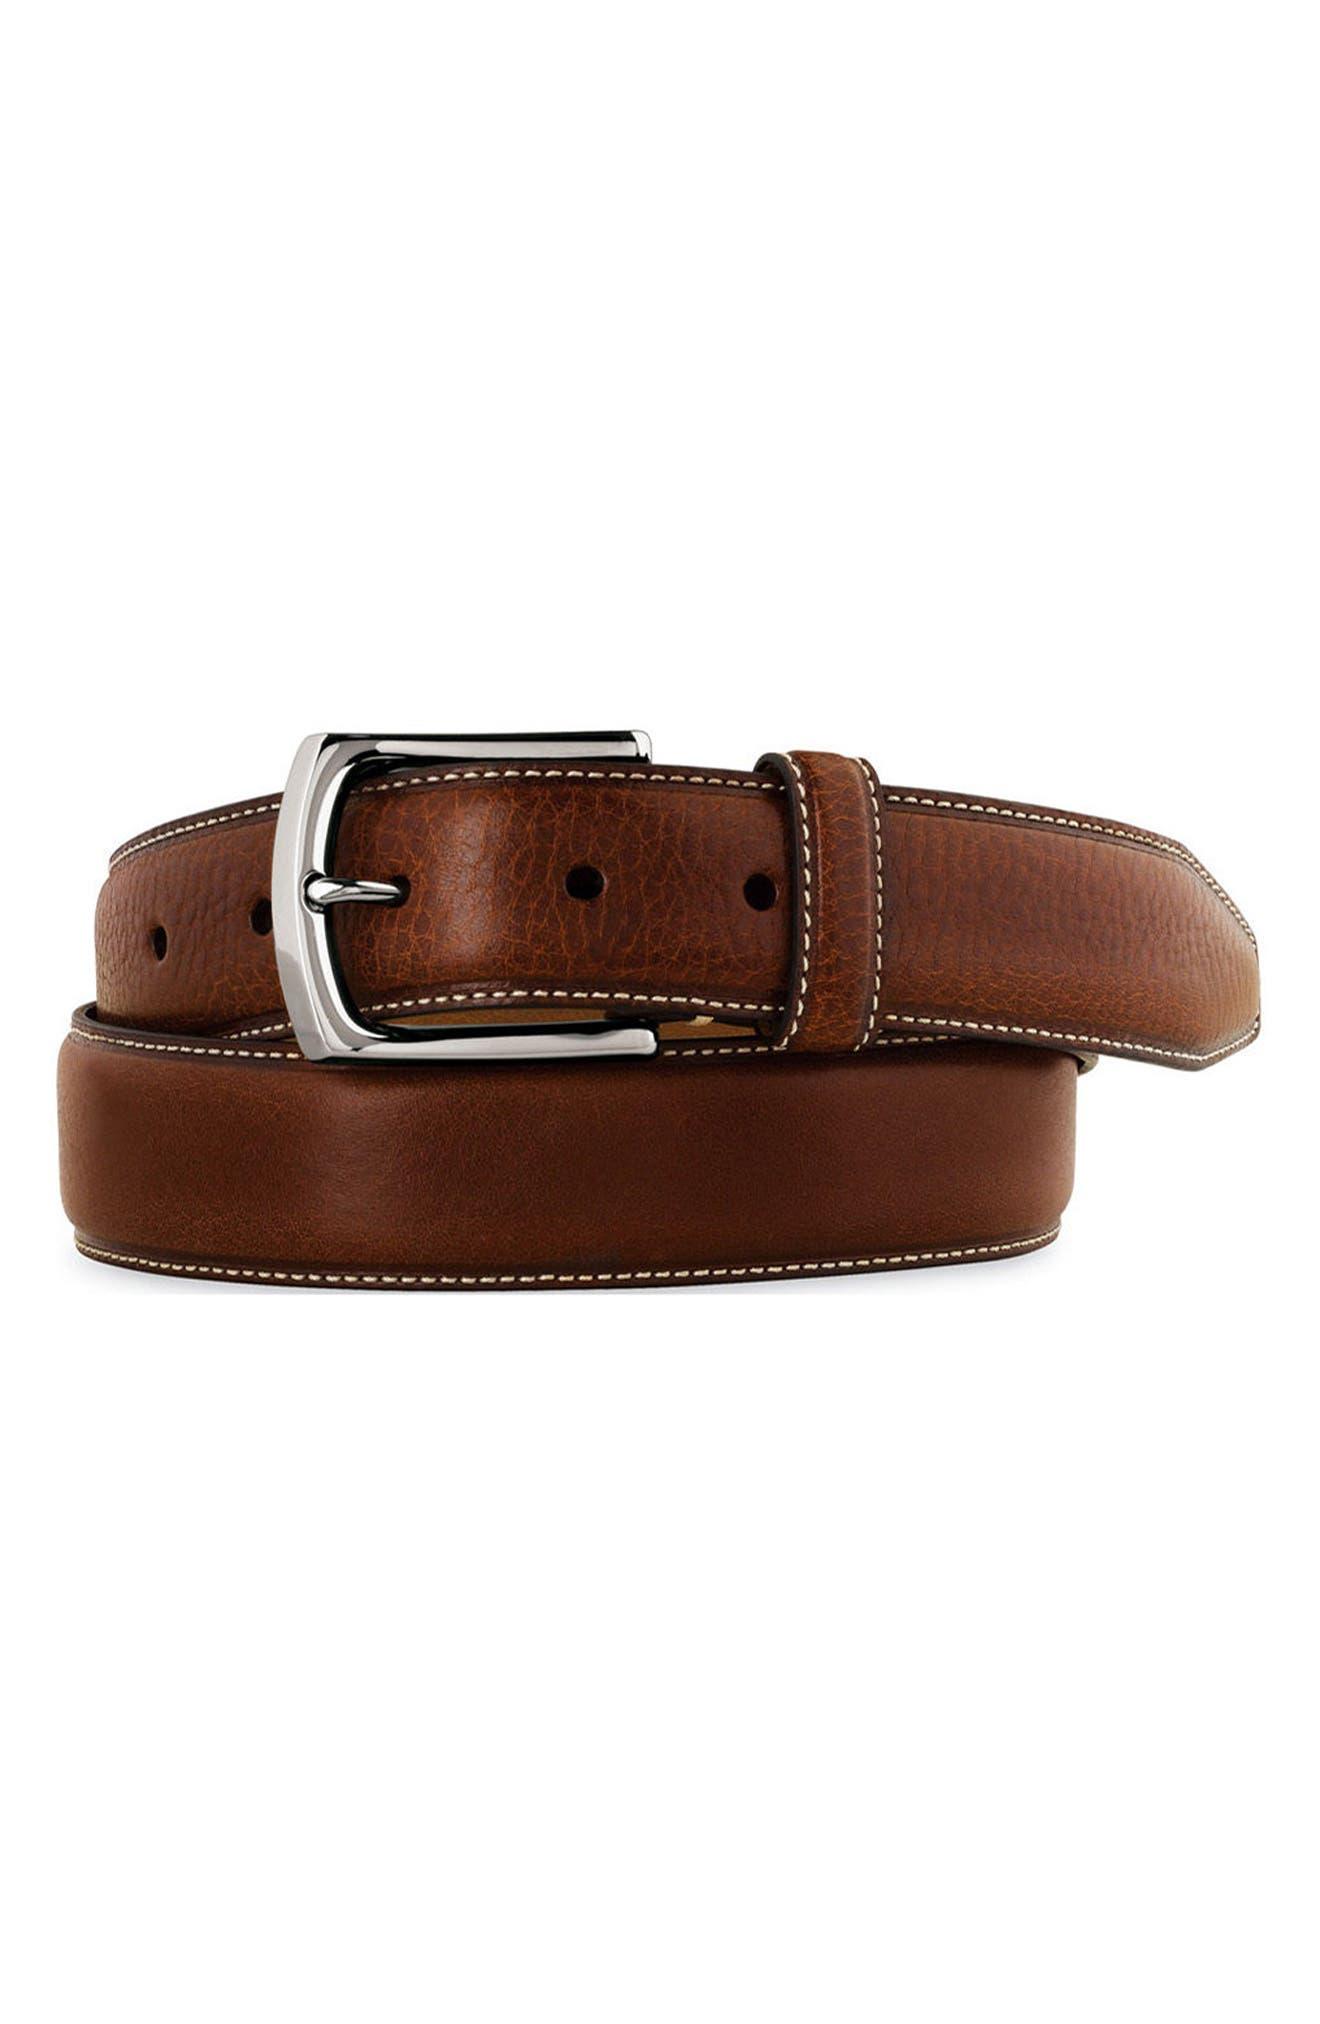 Calfskin Leather Belt,                         Main,                         color, Dark Brown